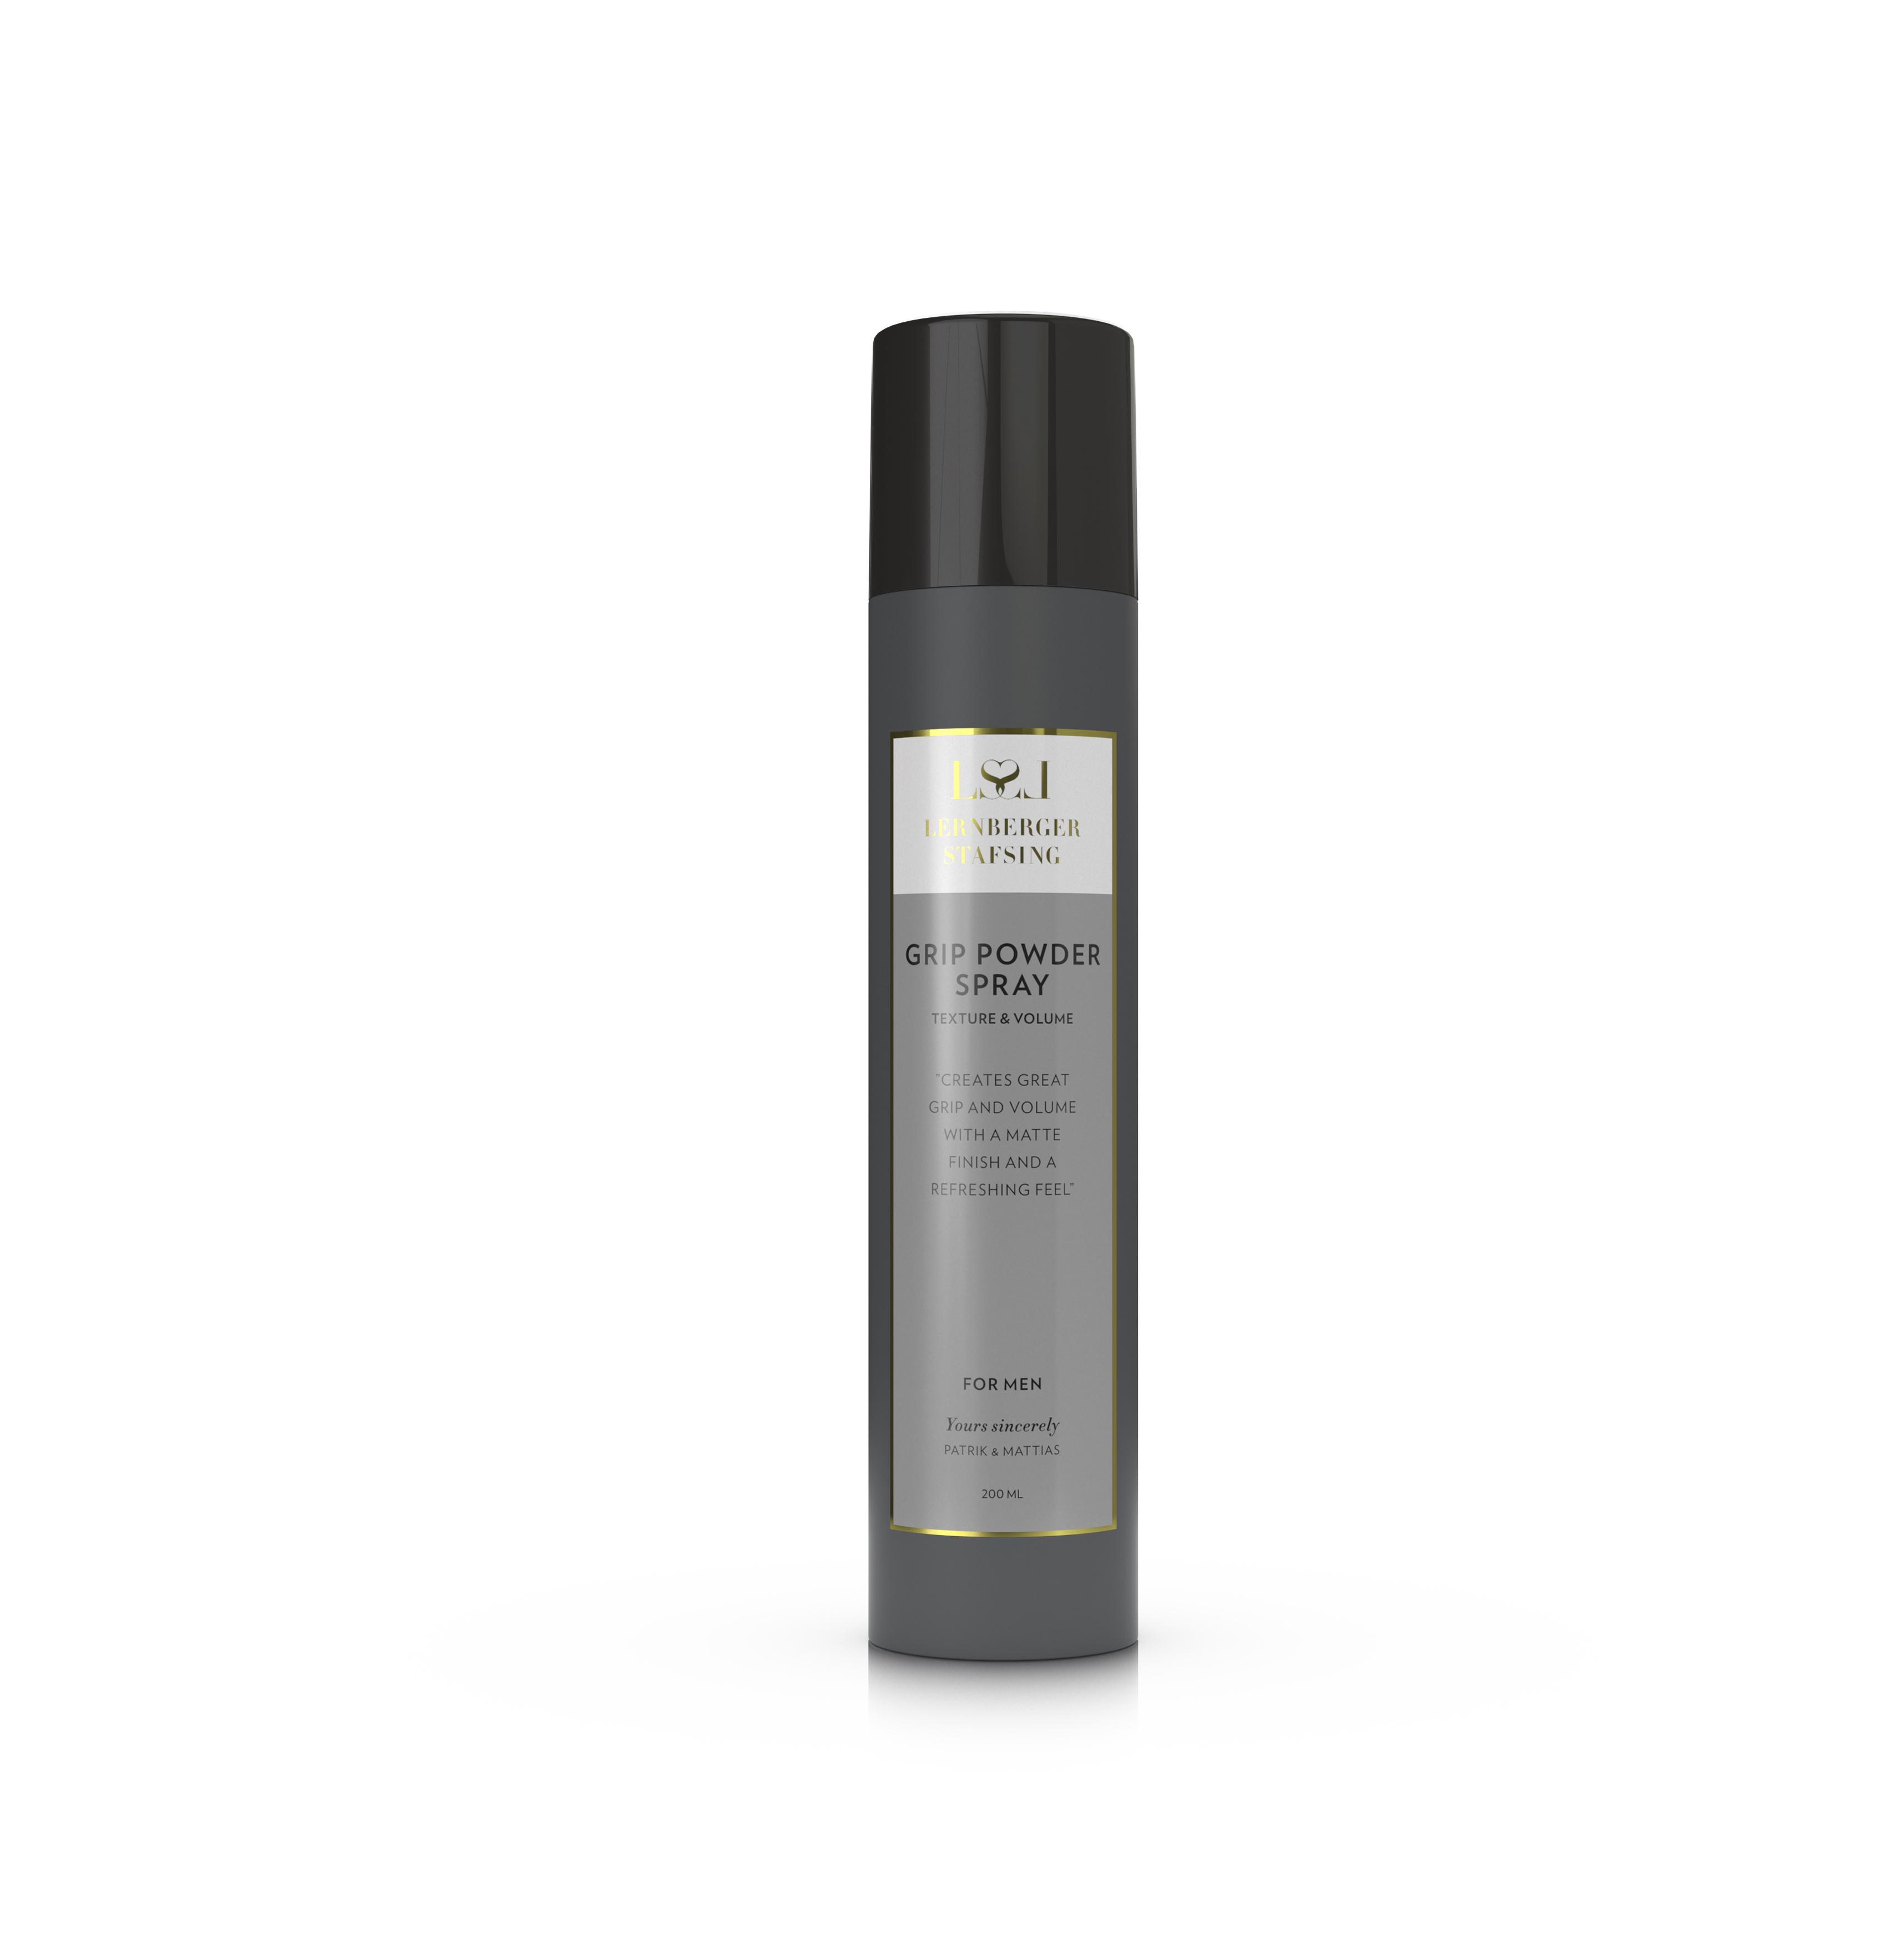 Lernberger Stafsing - MR LS Grip Powder Spray Men 200 ml